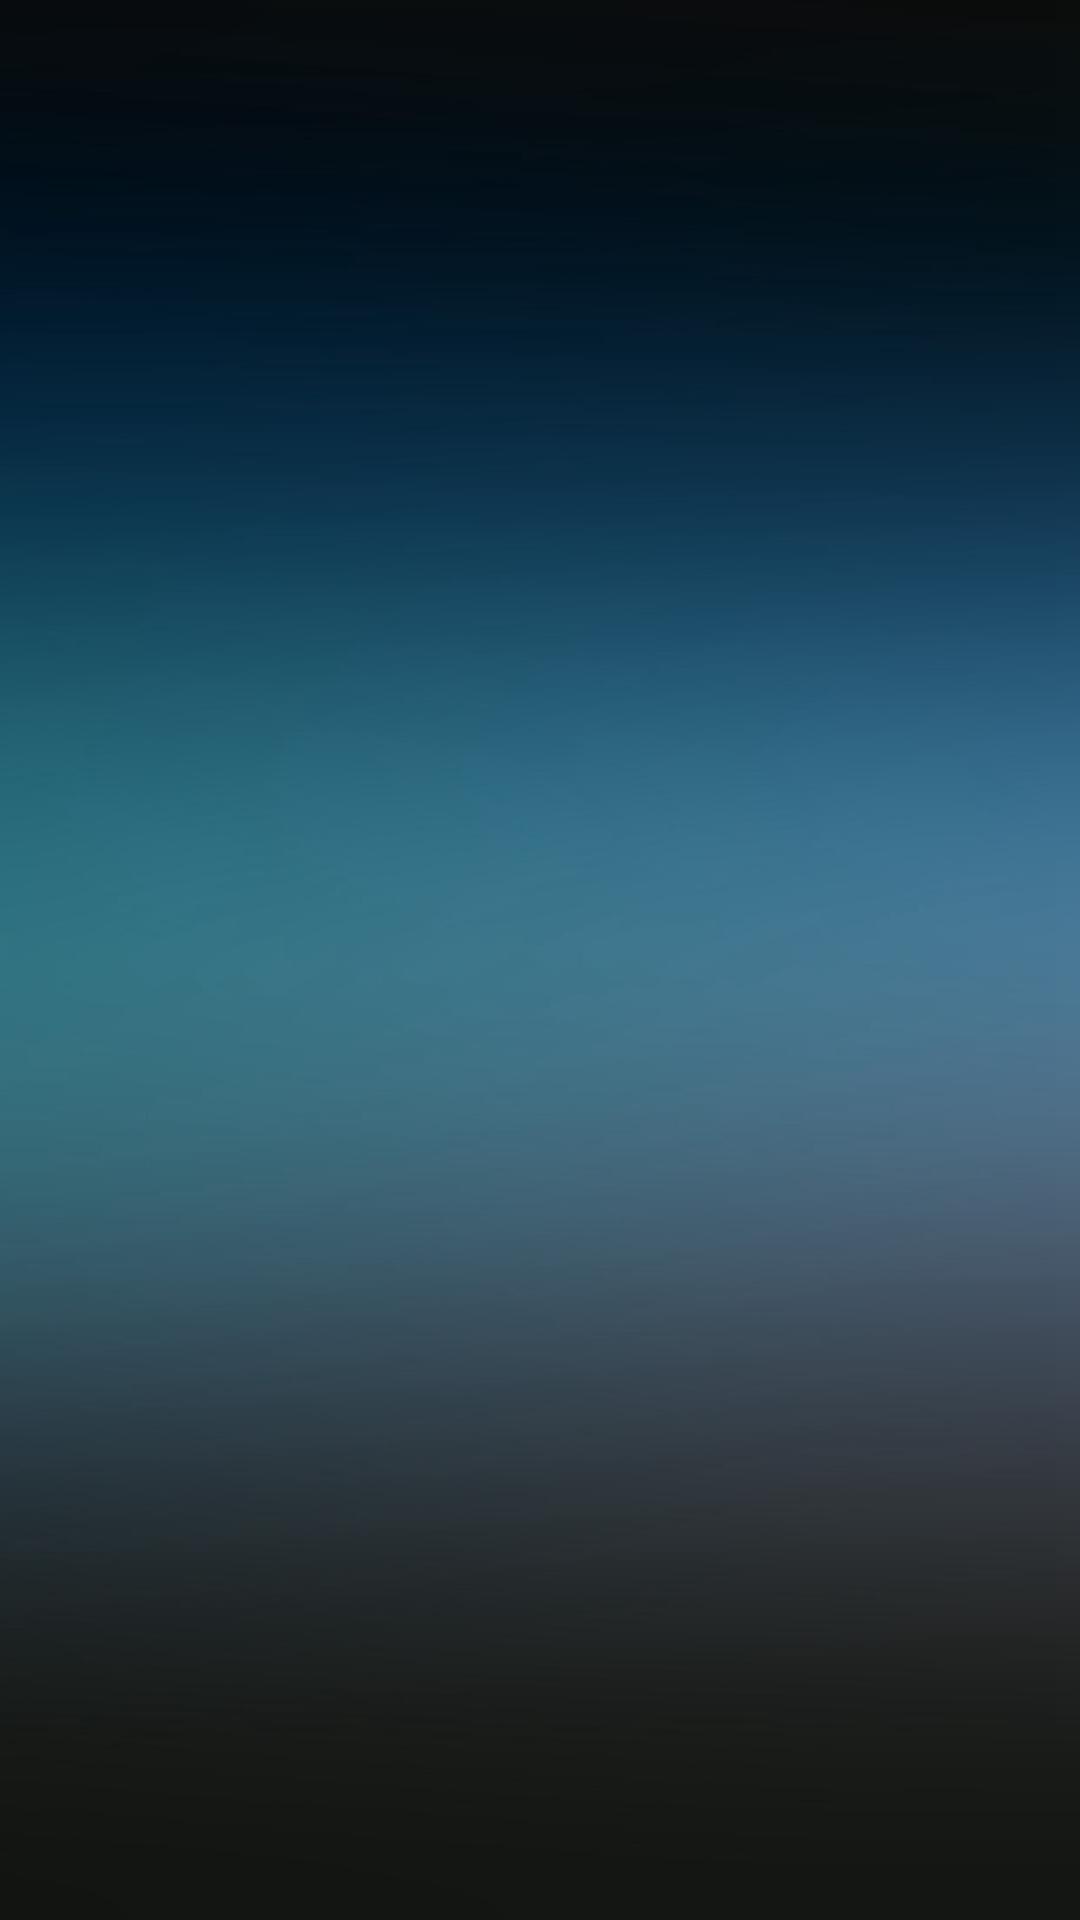 Blue-Soft-Pastel-Gradation-Blur-iPhone-wallpaper-wallpaper-wp4804815